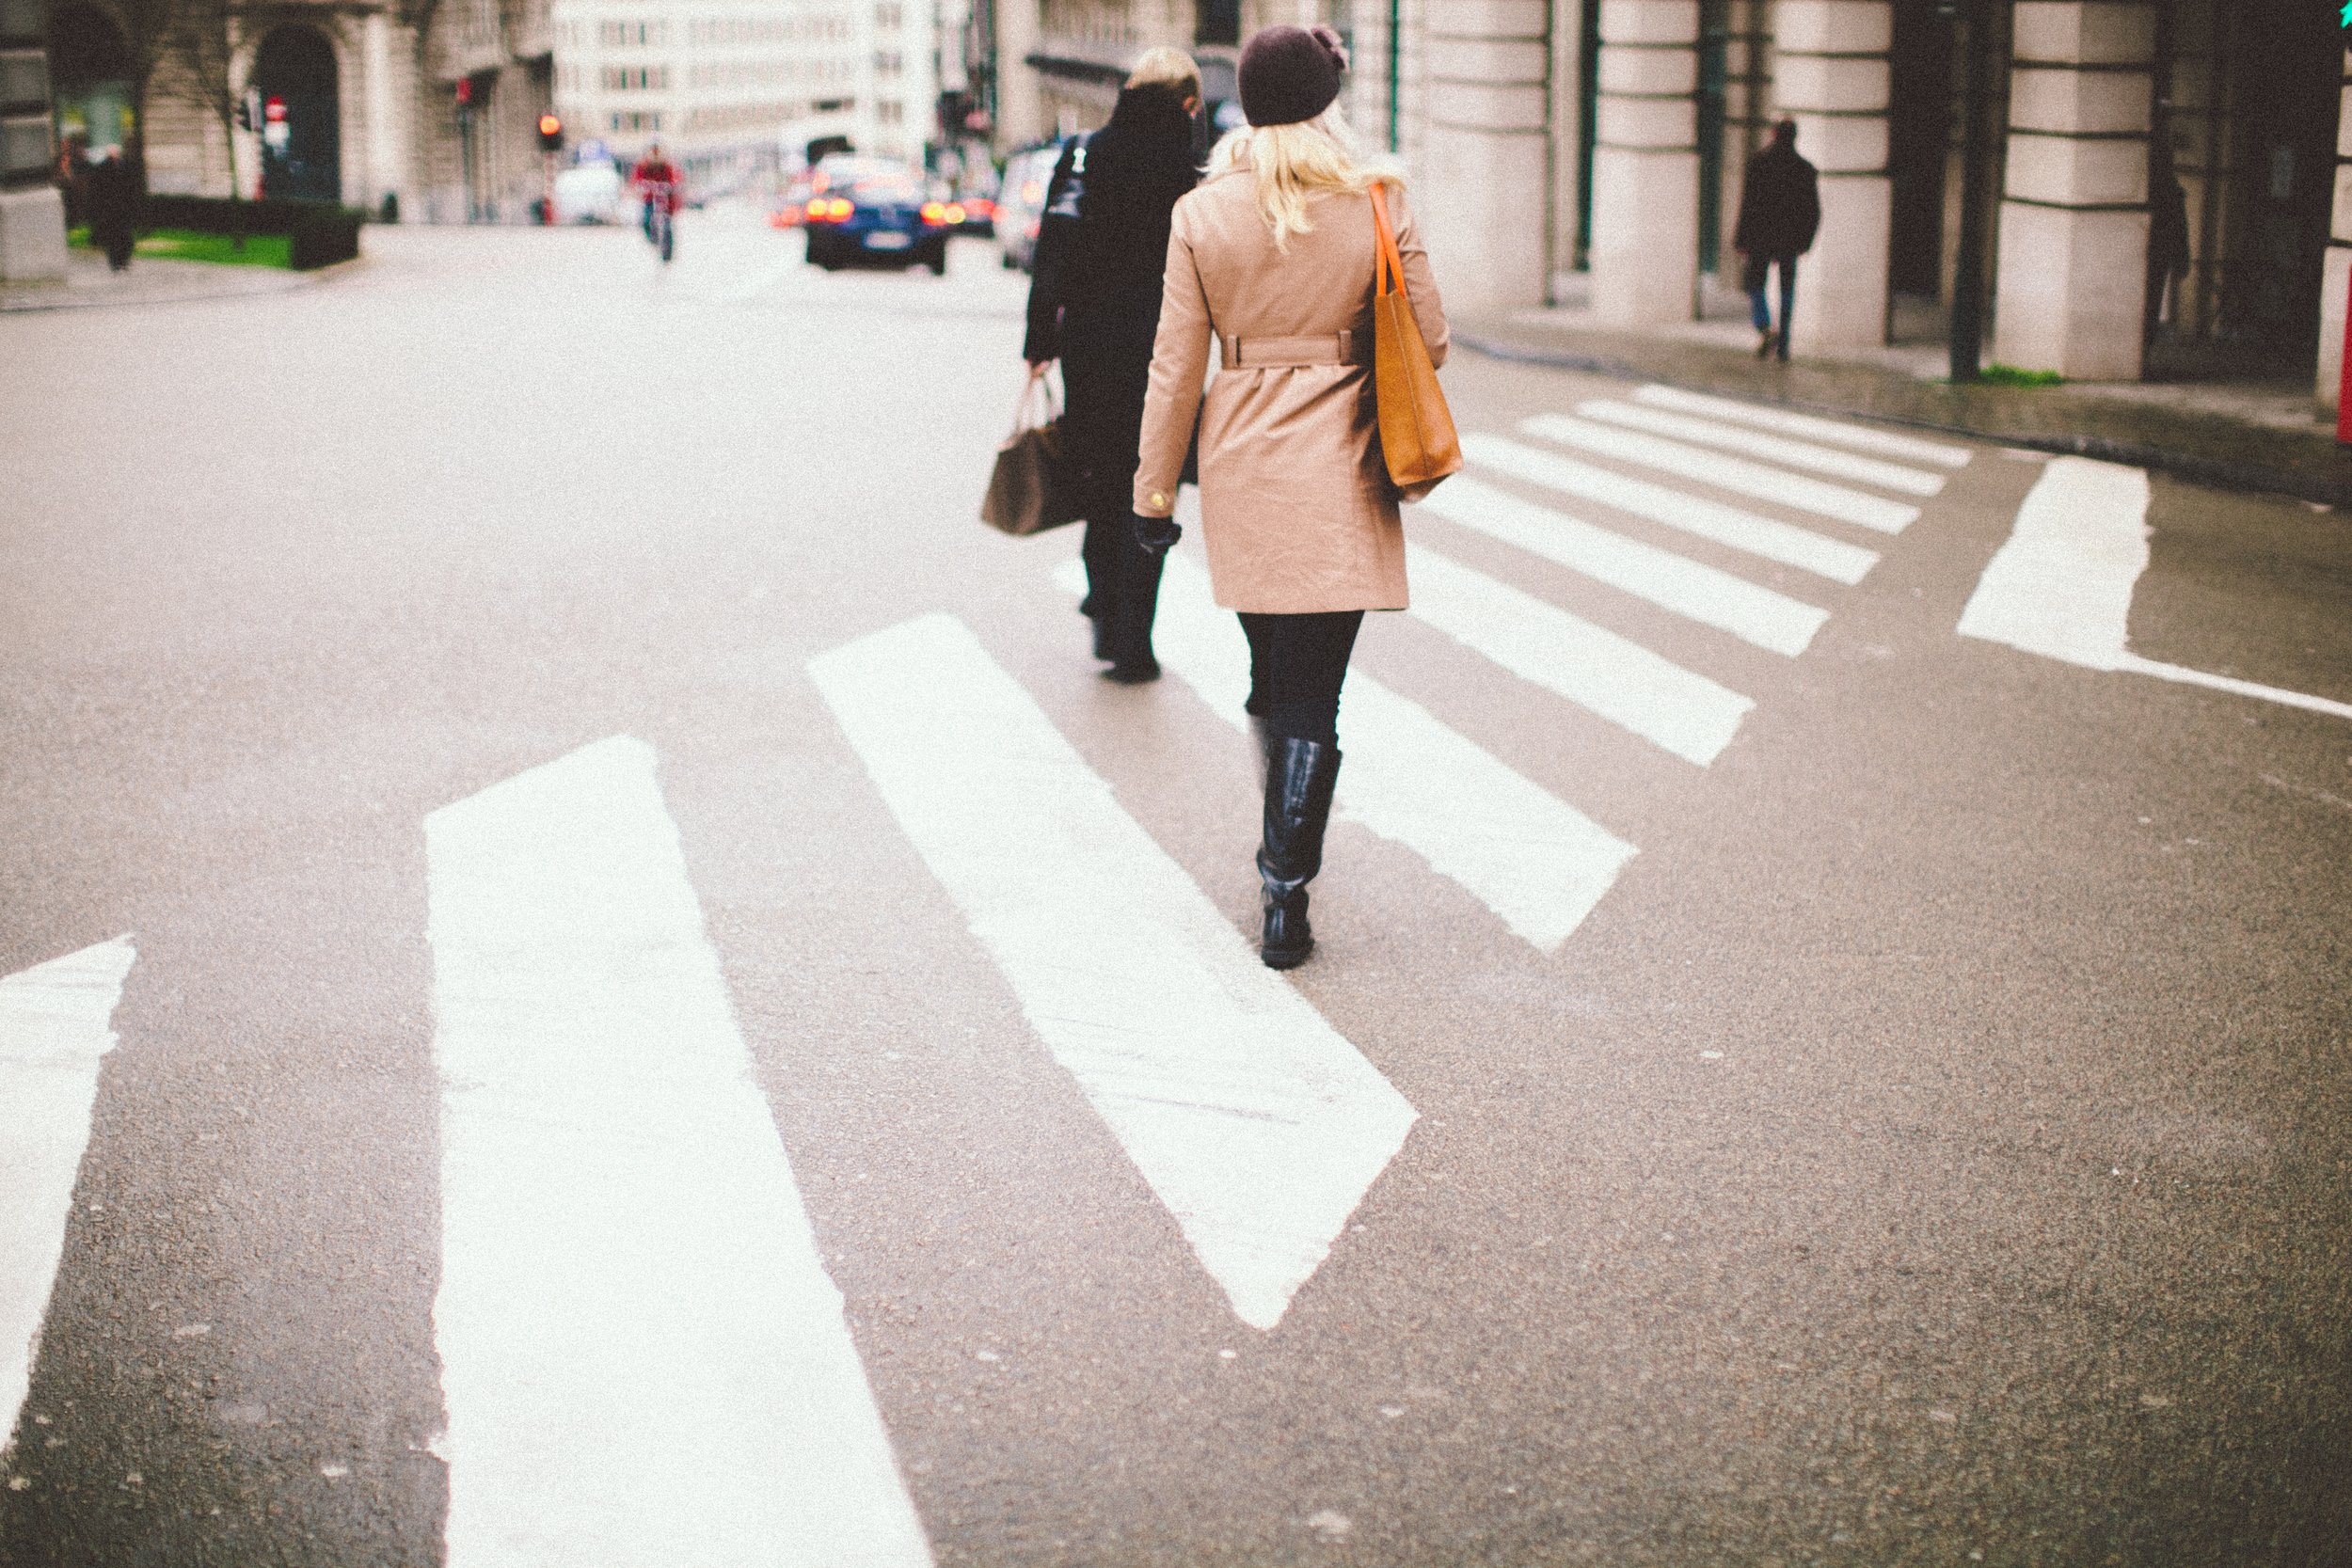 pedestrian-walking-people-road-white-traffic-720155-pxhere.com.jpg